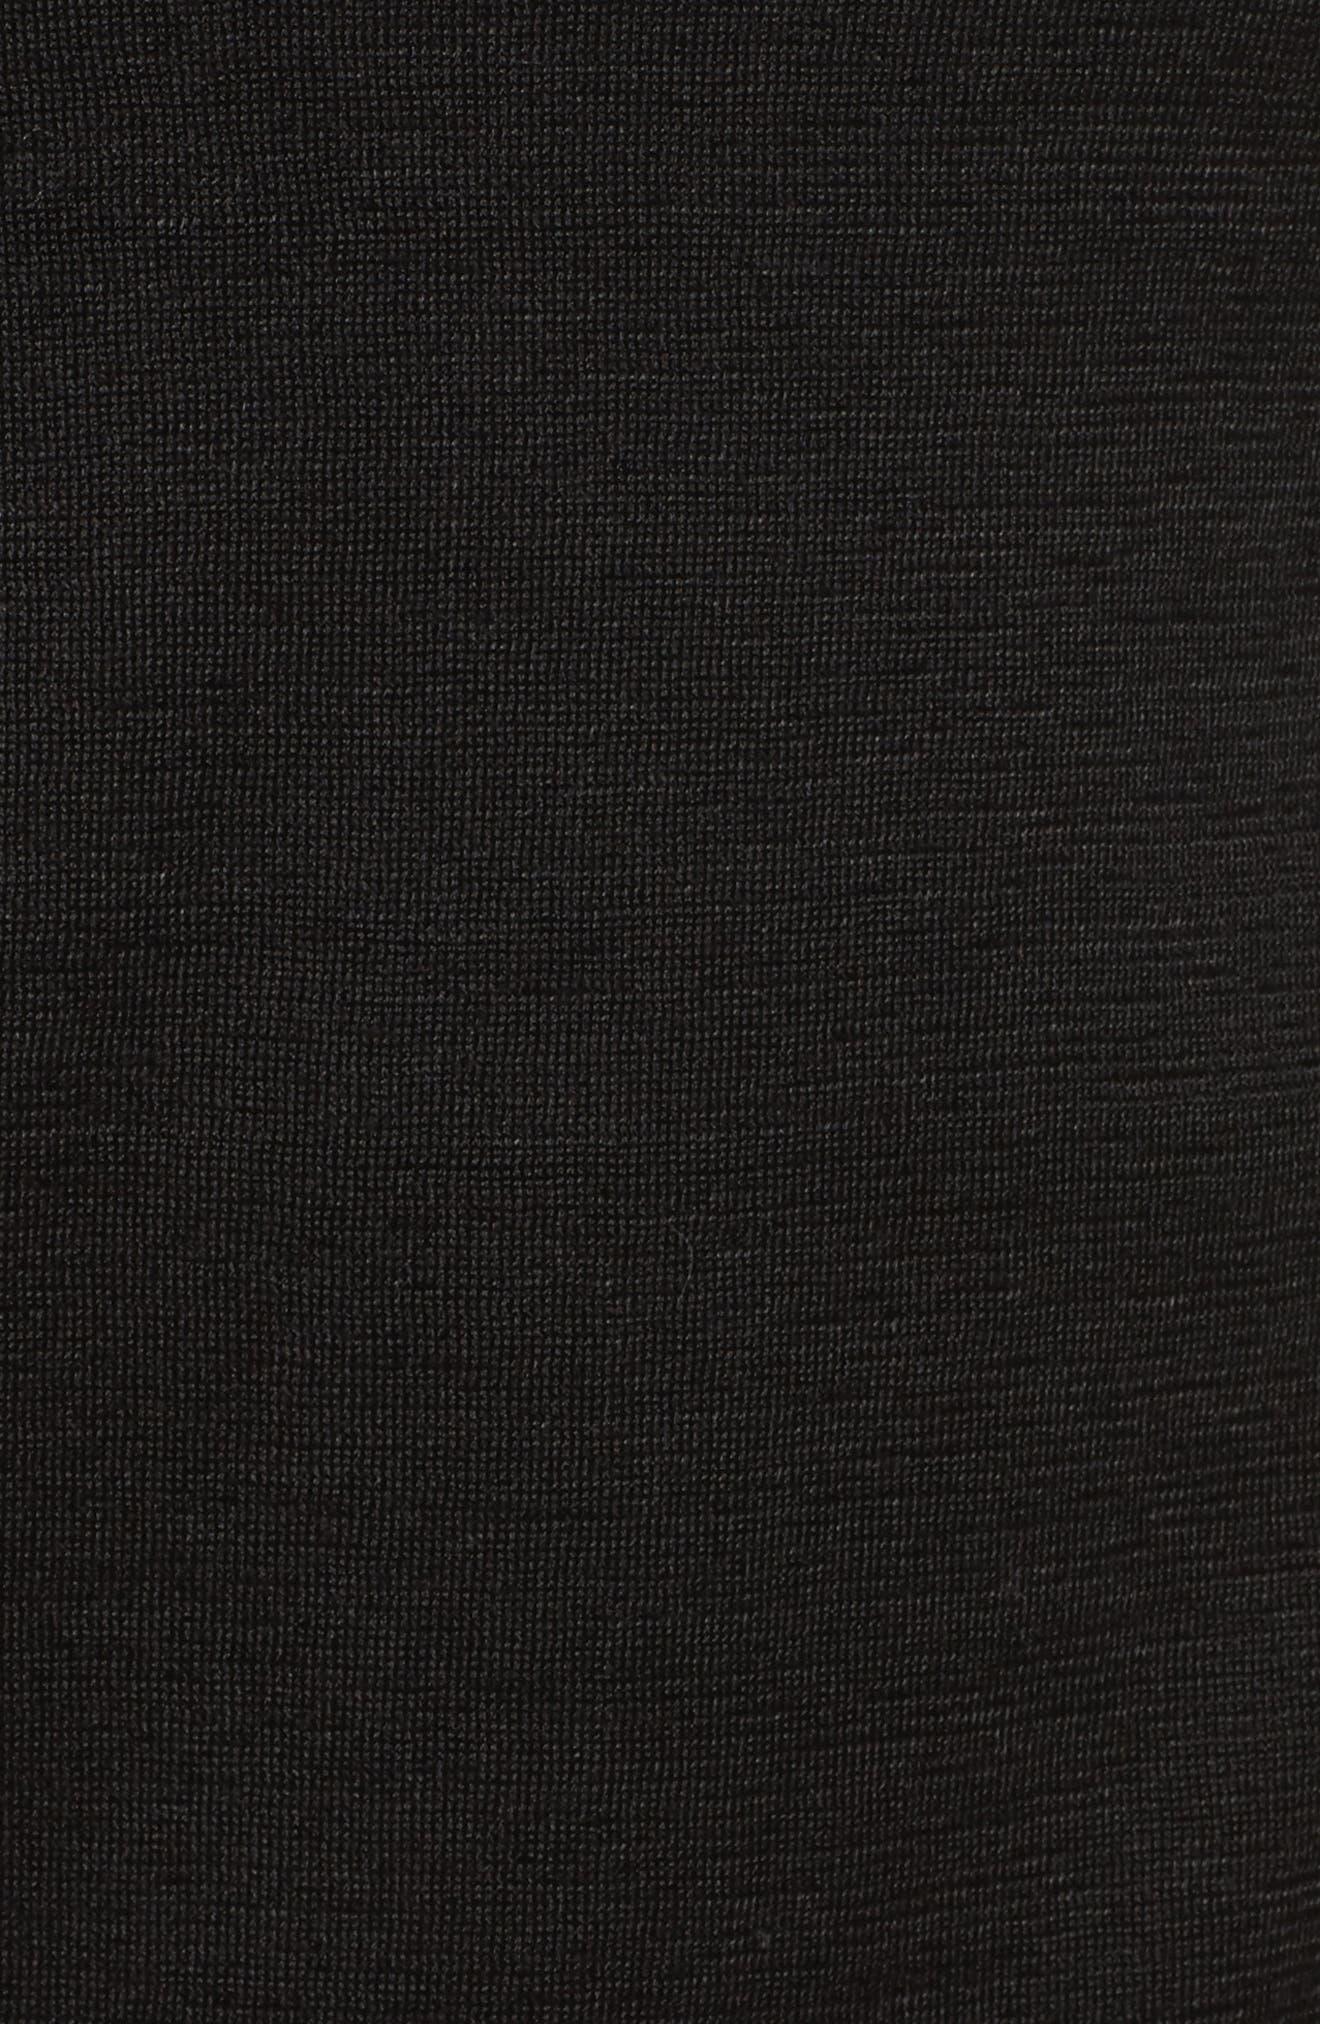 NICE+ZOE Crochet Trim Linen Blend Top,                             Alternate thumbnail 5, color,                             Black Onyx